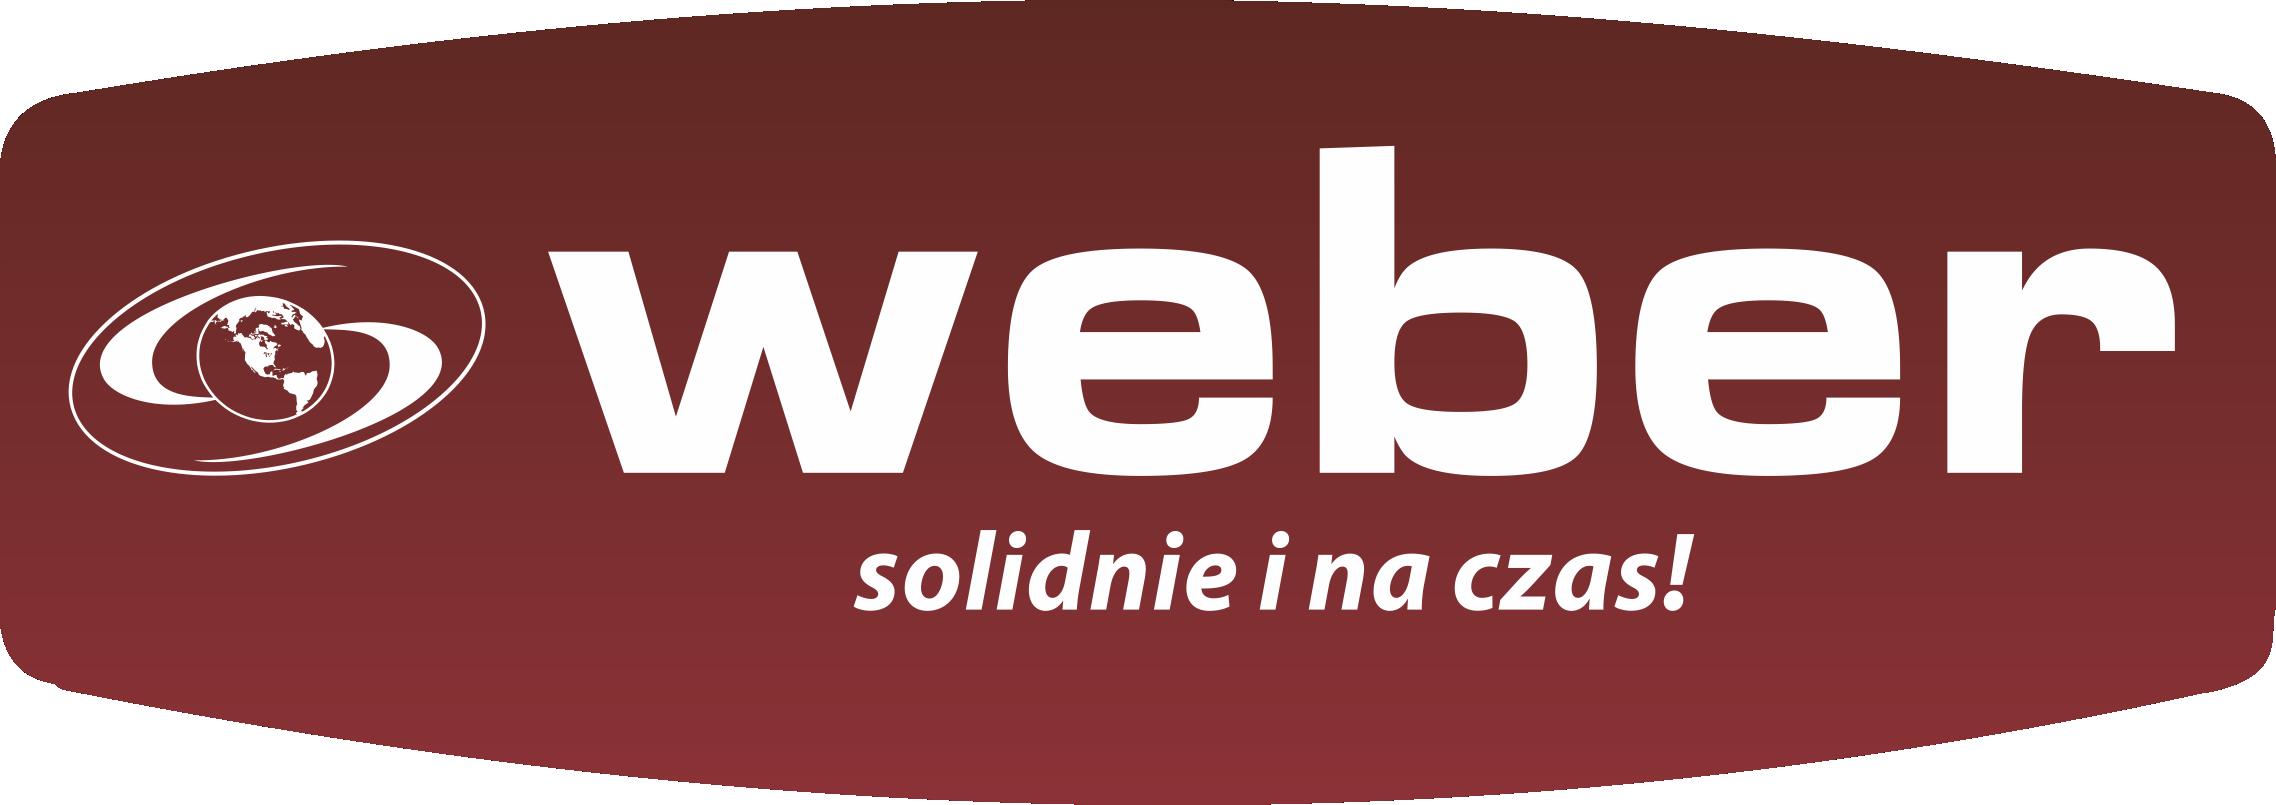 Weber - Biuro Tłumaczeń i Usług EN